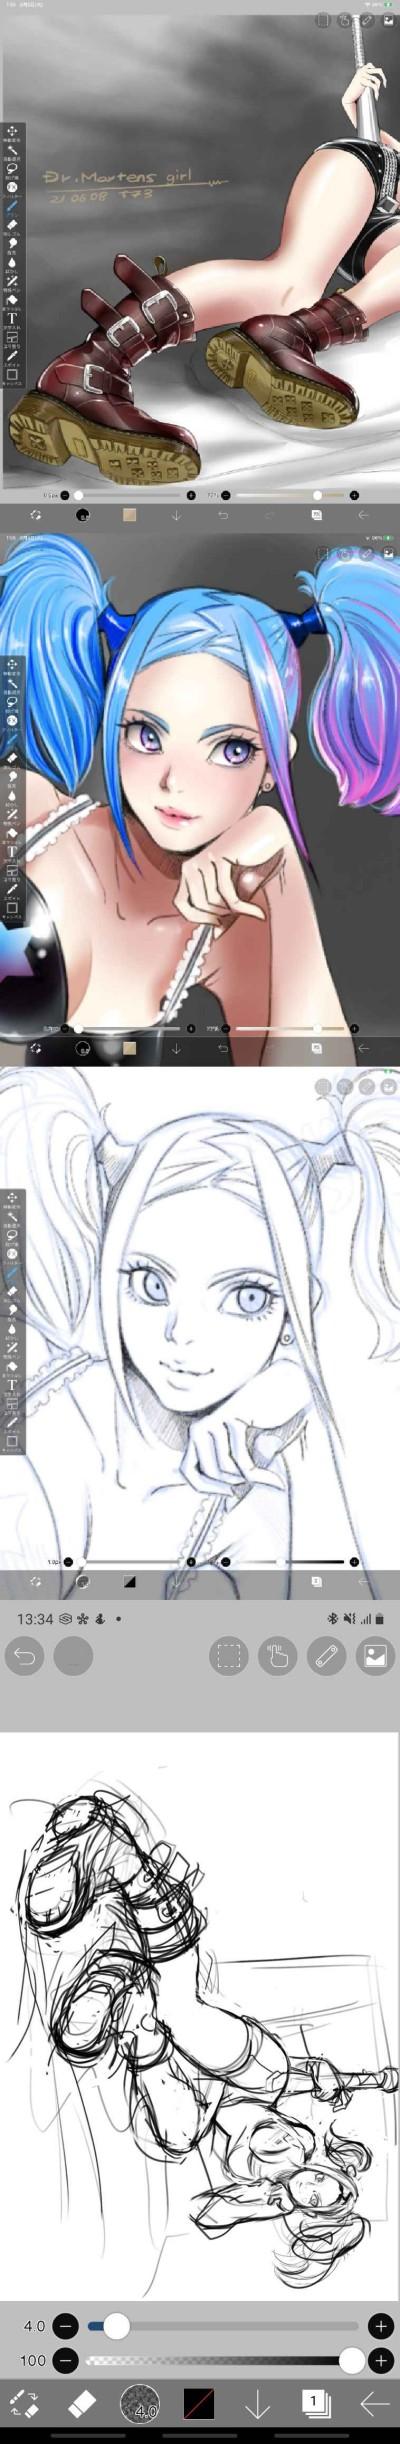 progress drawing  | tosi73 | Digital Drawing | PENUP